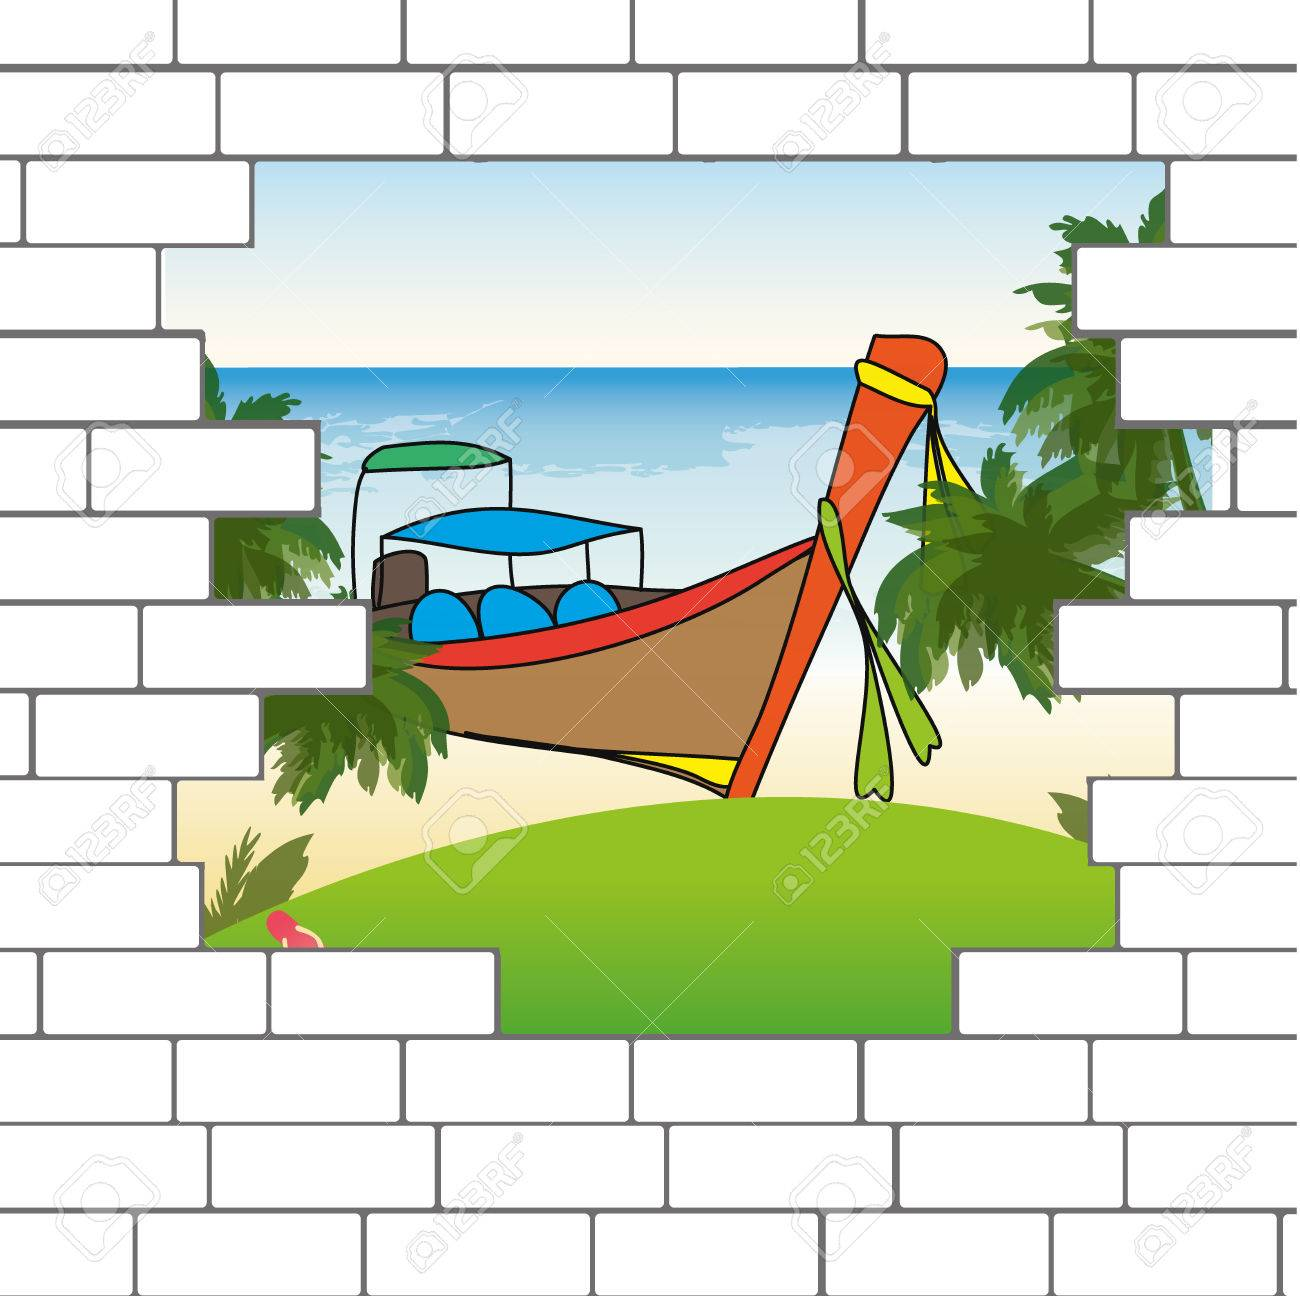 break in the brick wall with a beautiful ocean beach and longtail rh 123rf com Cartoon Brick Holes in Walls Hole in Wall Clip Art